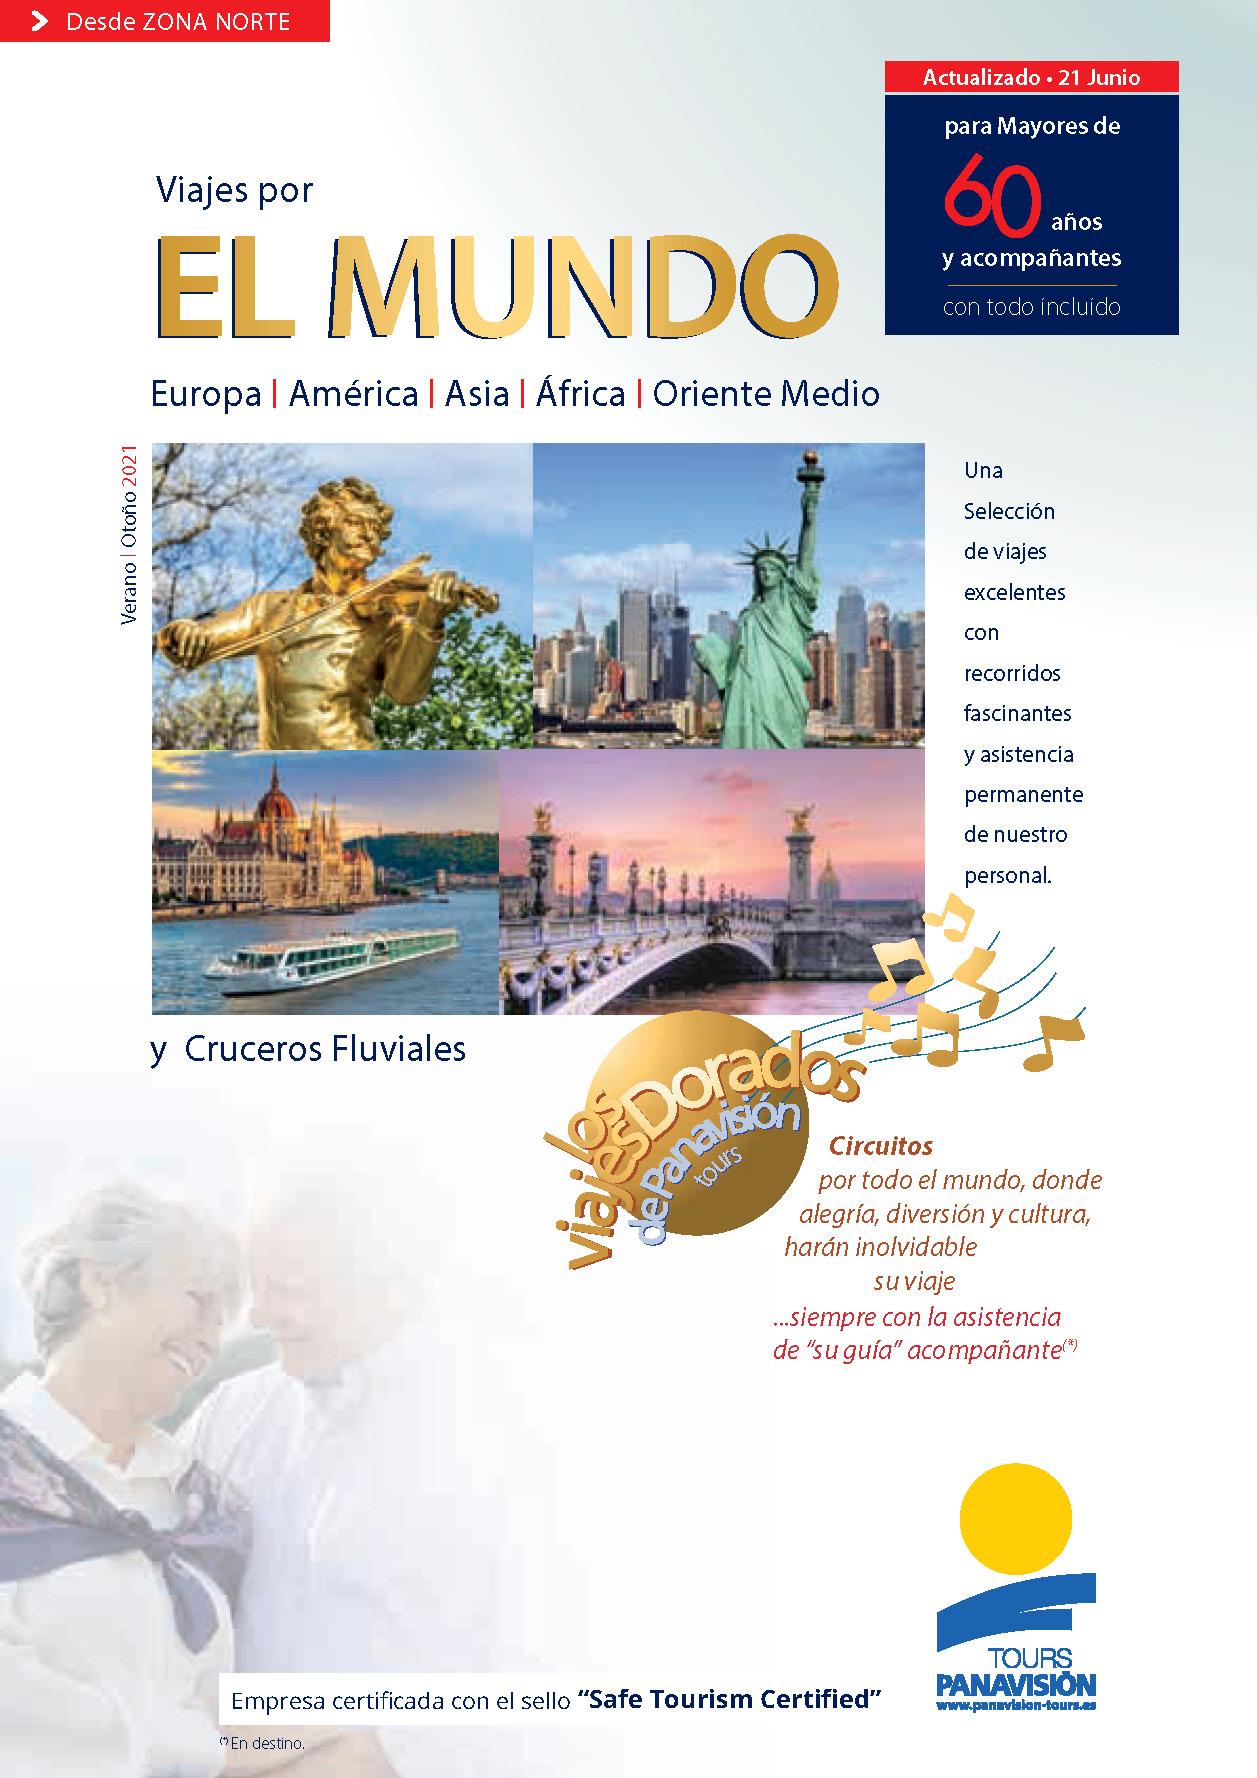 Catalogo Panavision Tours Viajes por el Mundo para mayores de 60 2021 salidas zona norte NS1